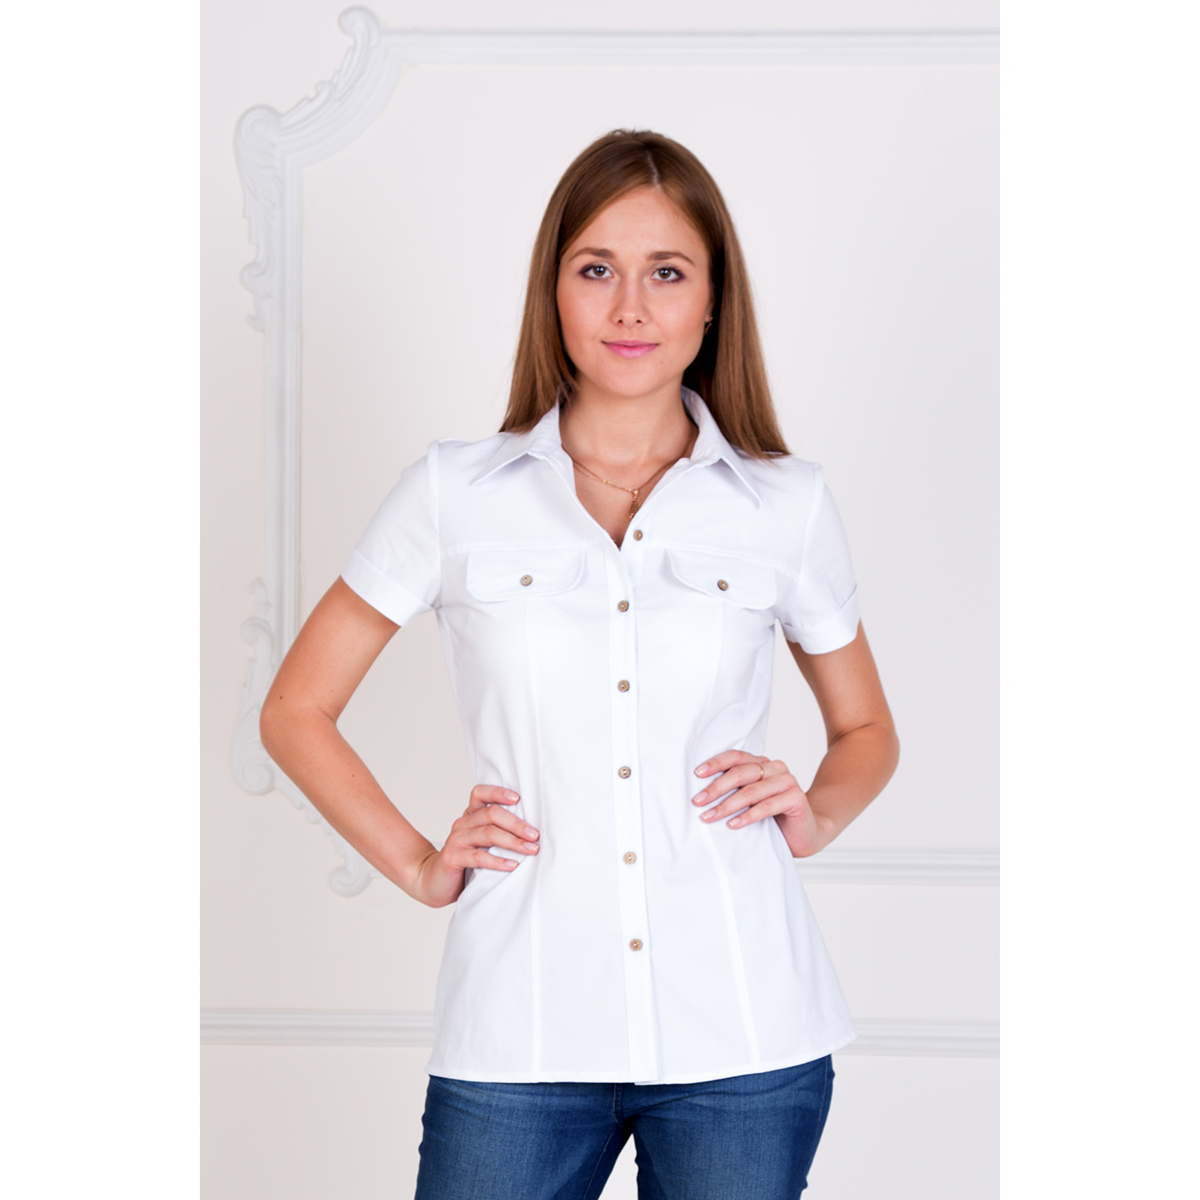 Женская рубашка Александра Белый, размер 46Блузки, майки, кофты<br>Обхват груди:92 см<br>Обхват талии:74 см<br>Обхват бедер:100 см<br>Рост:167 см<br><br>Тип: Жен. рубашка<br>Размер: 46<br>Материал: Хлопок